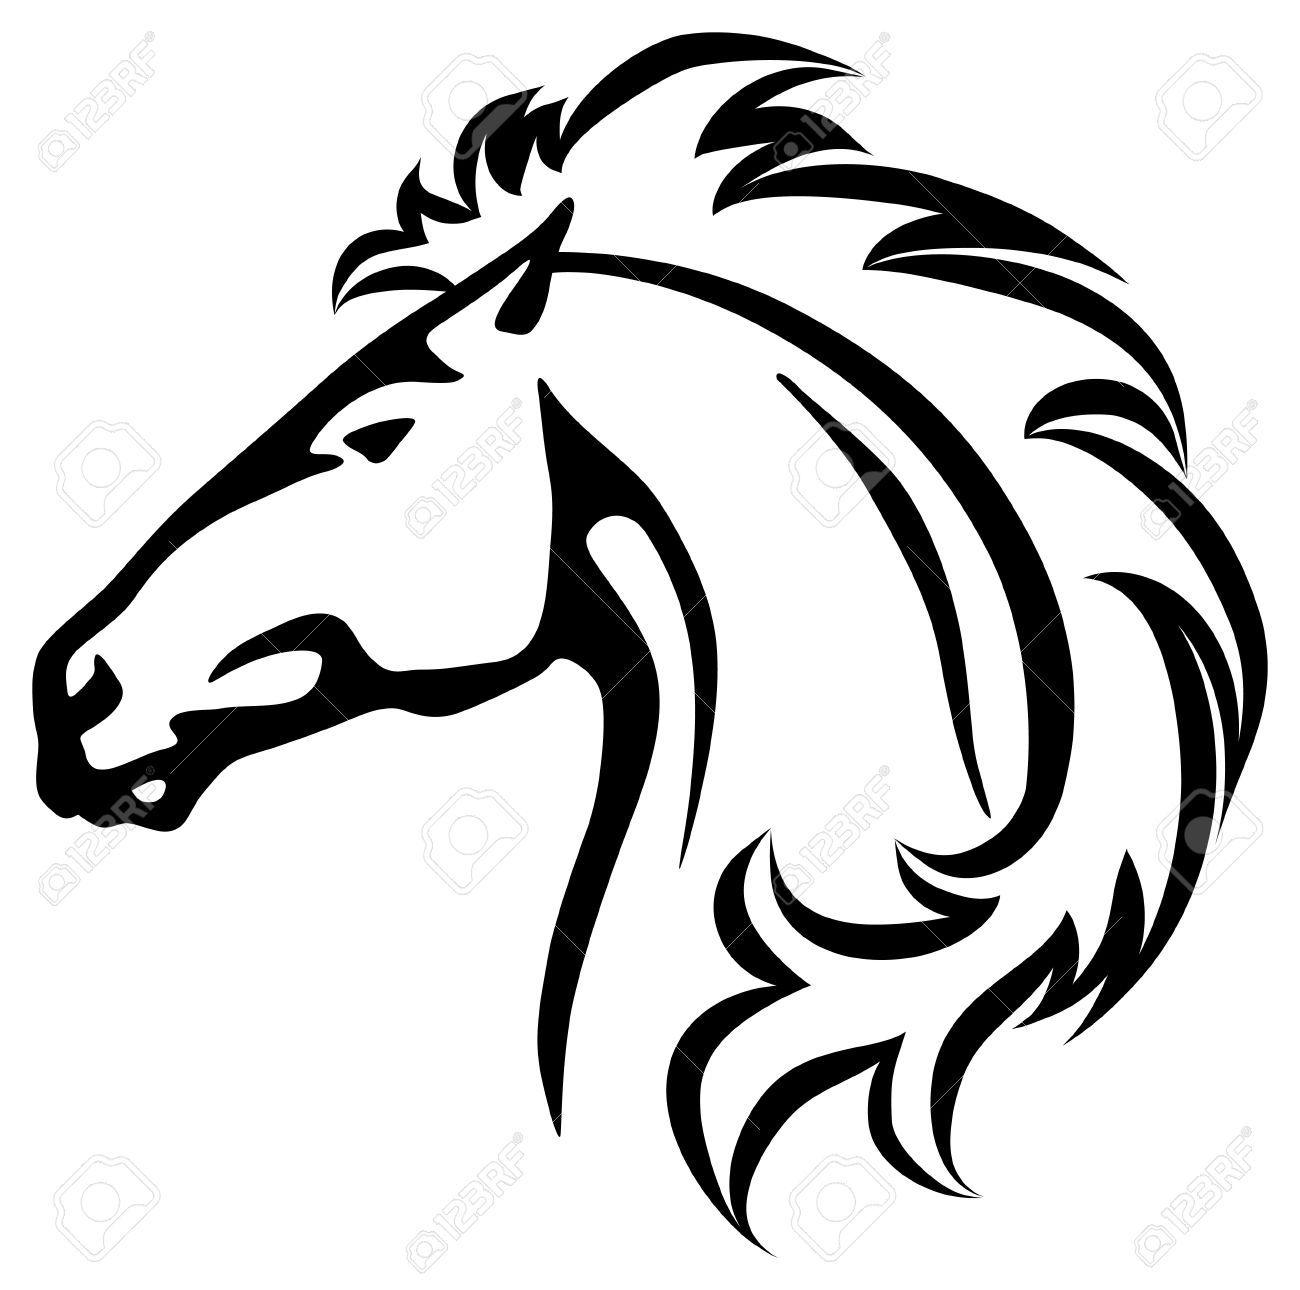 Wildhorse clipart jpg stock Wild horse clipart 3 » Clipart Portal jpg stock